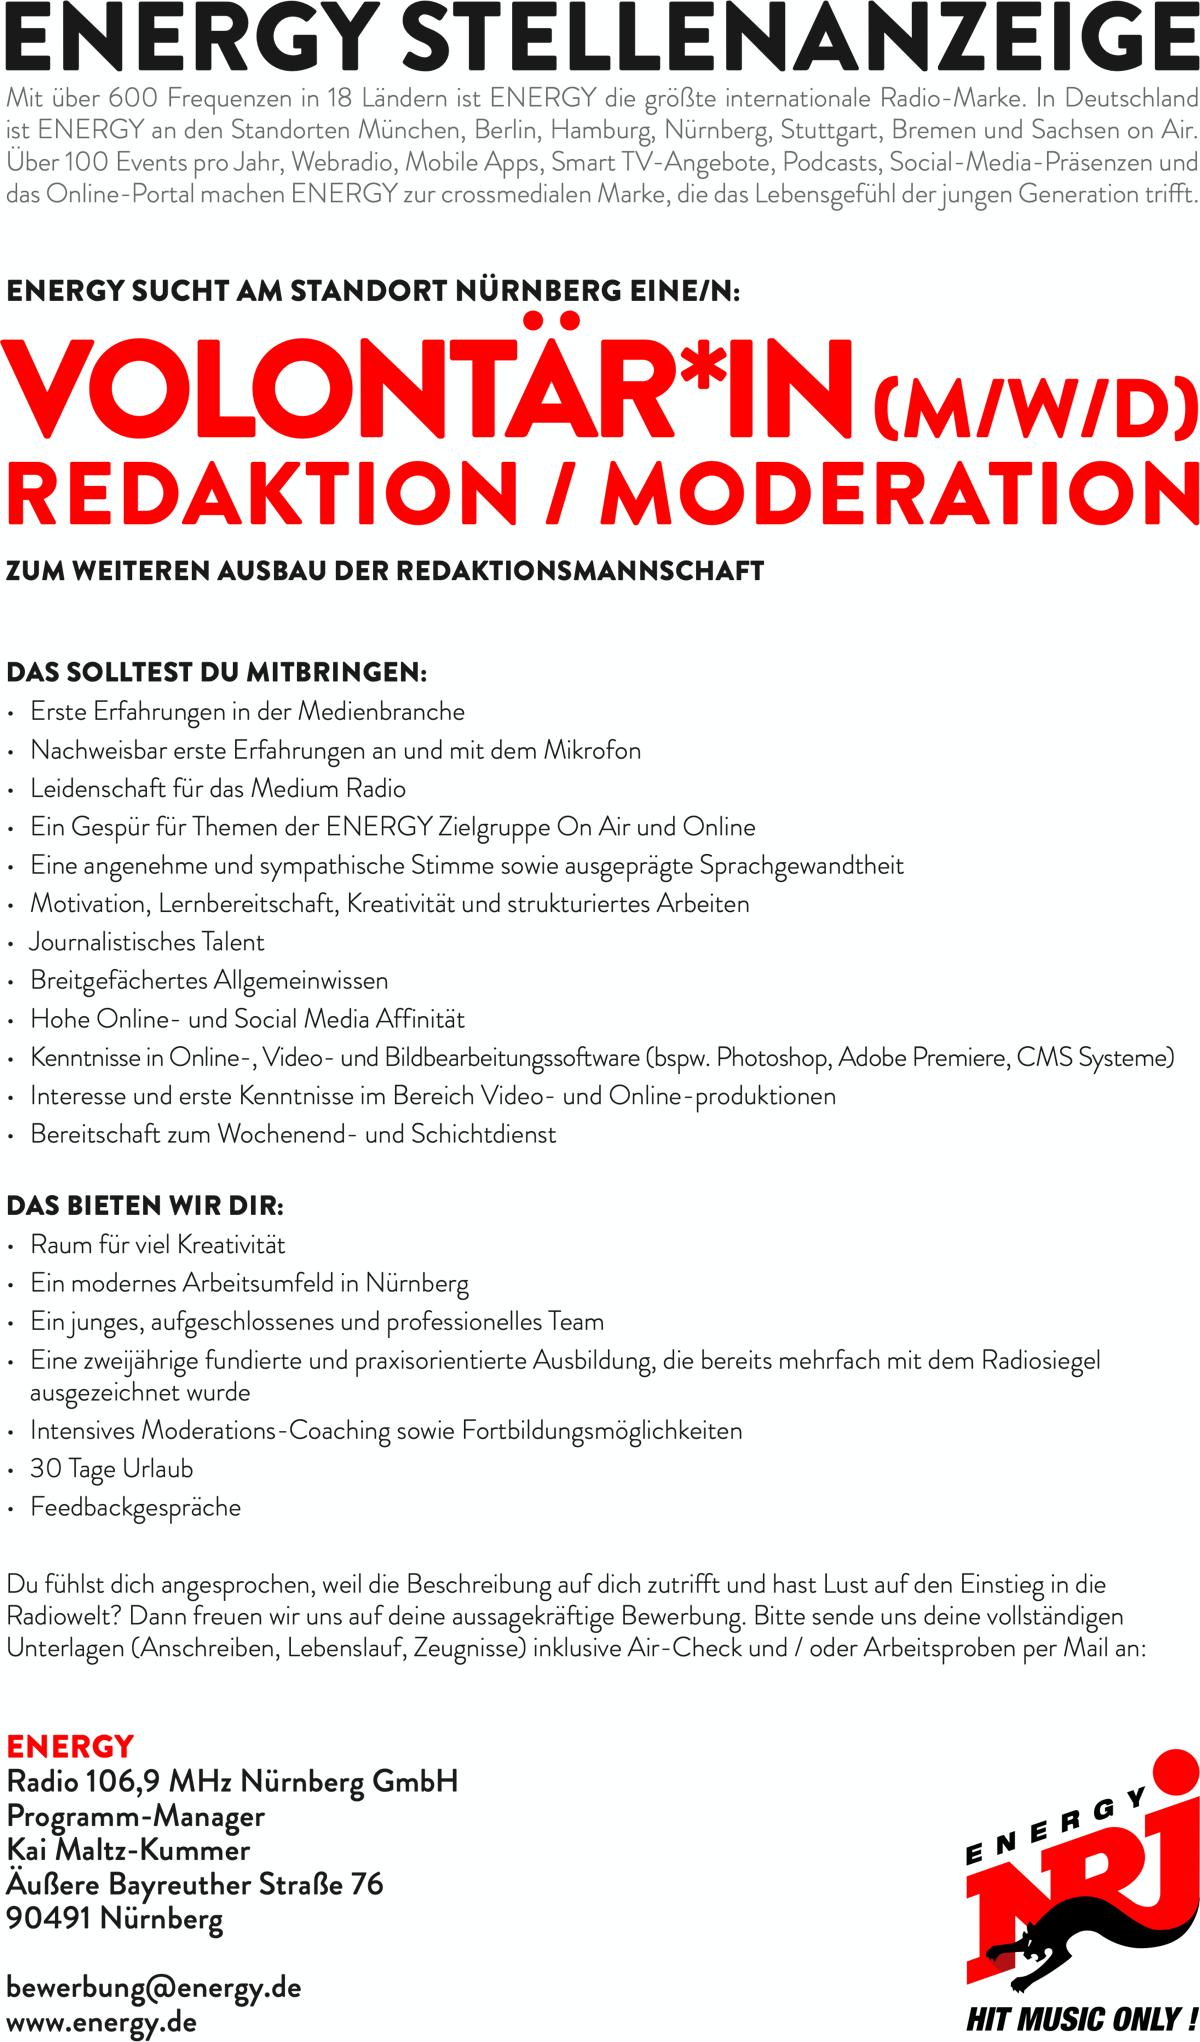 ENERGY Nürnberg sucht Volontär*in (m/w/d) Redaktion/Moderation